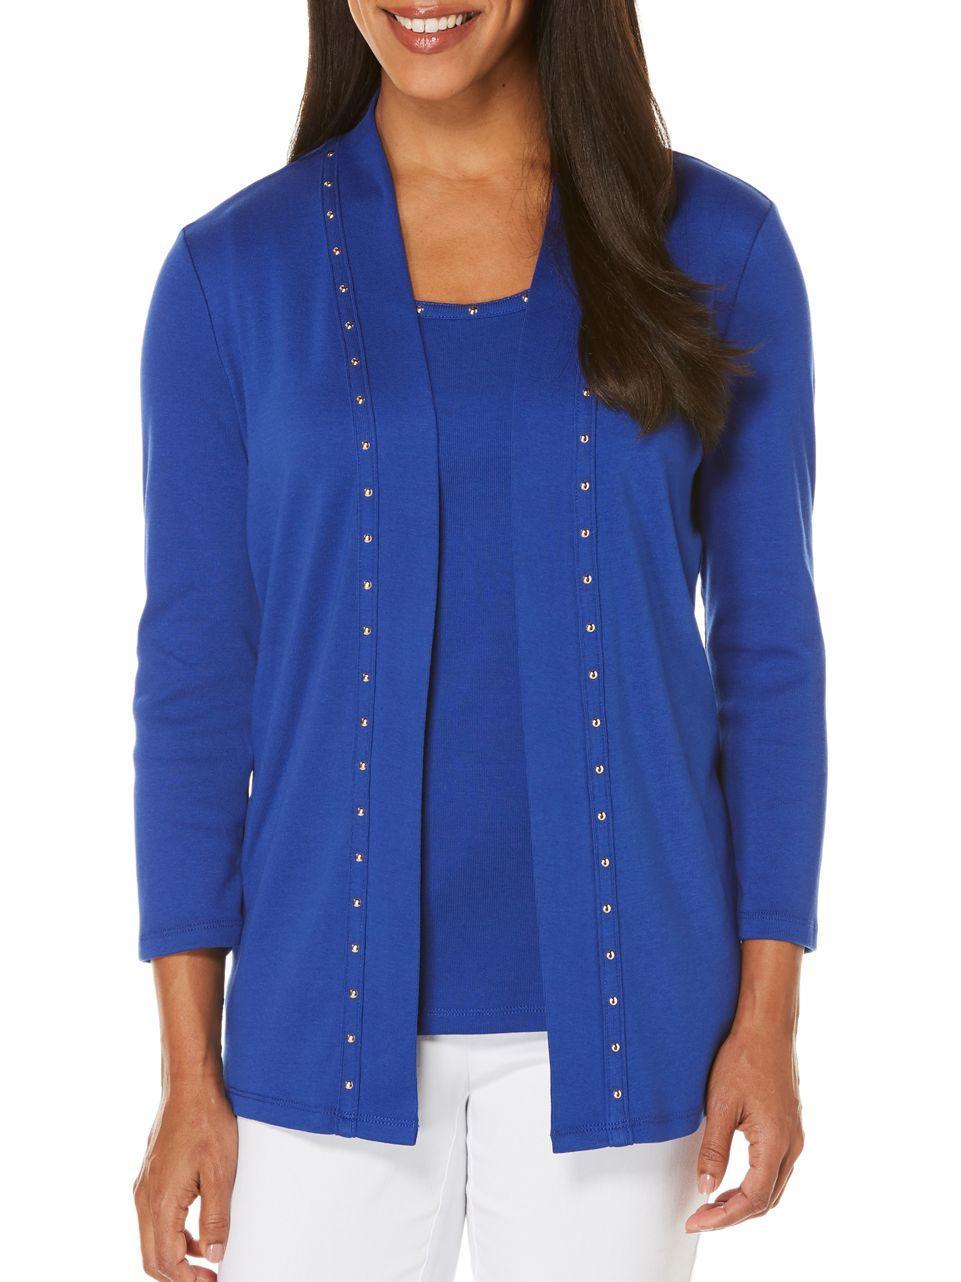 Lyst rafaella stud cotton cardigan in blue for Dress shirt studs uk